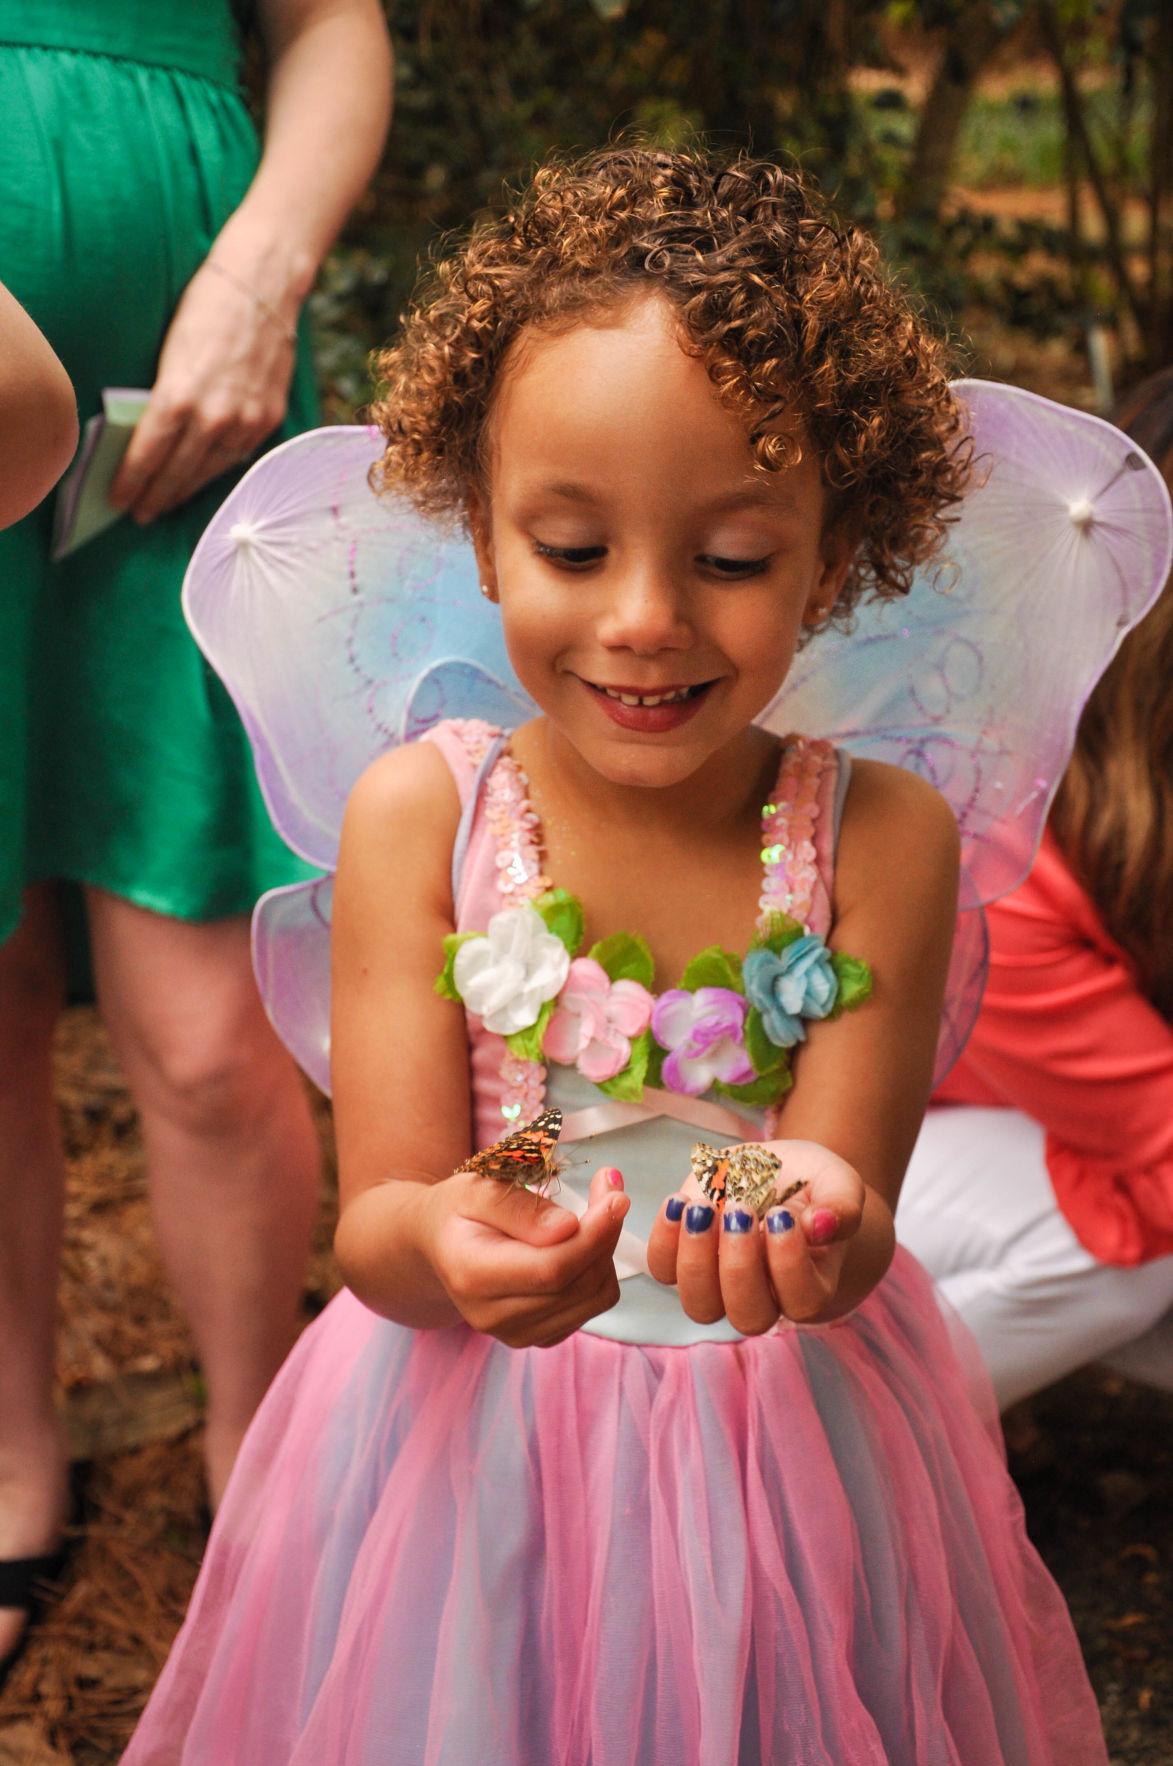 104677d5f72c Princess Tea Party held for girls | News | thepinelog.com